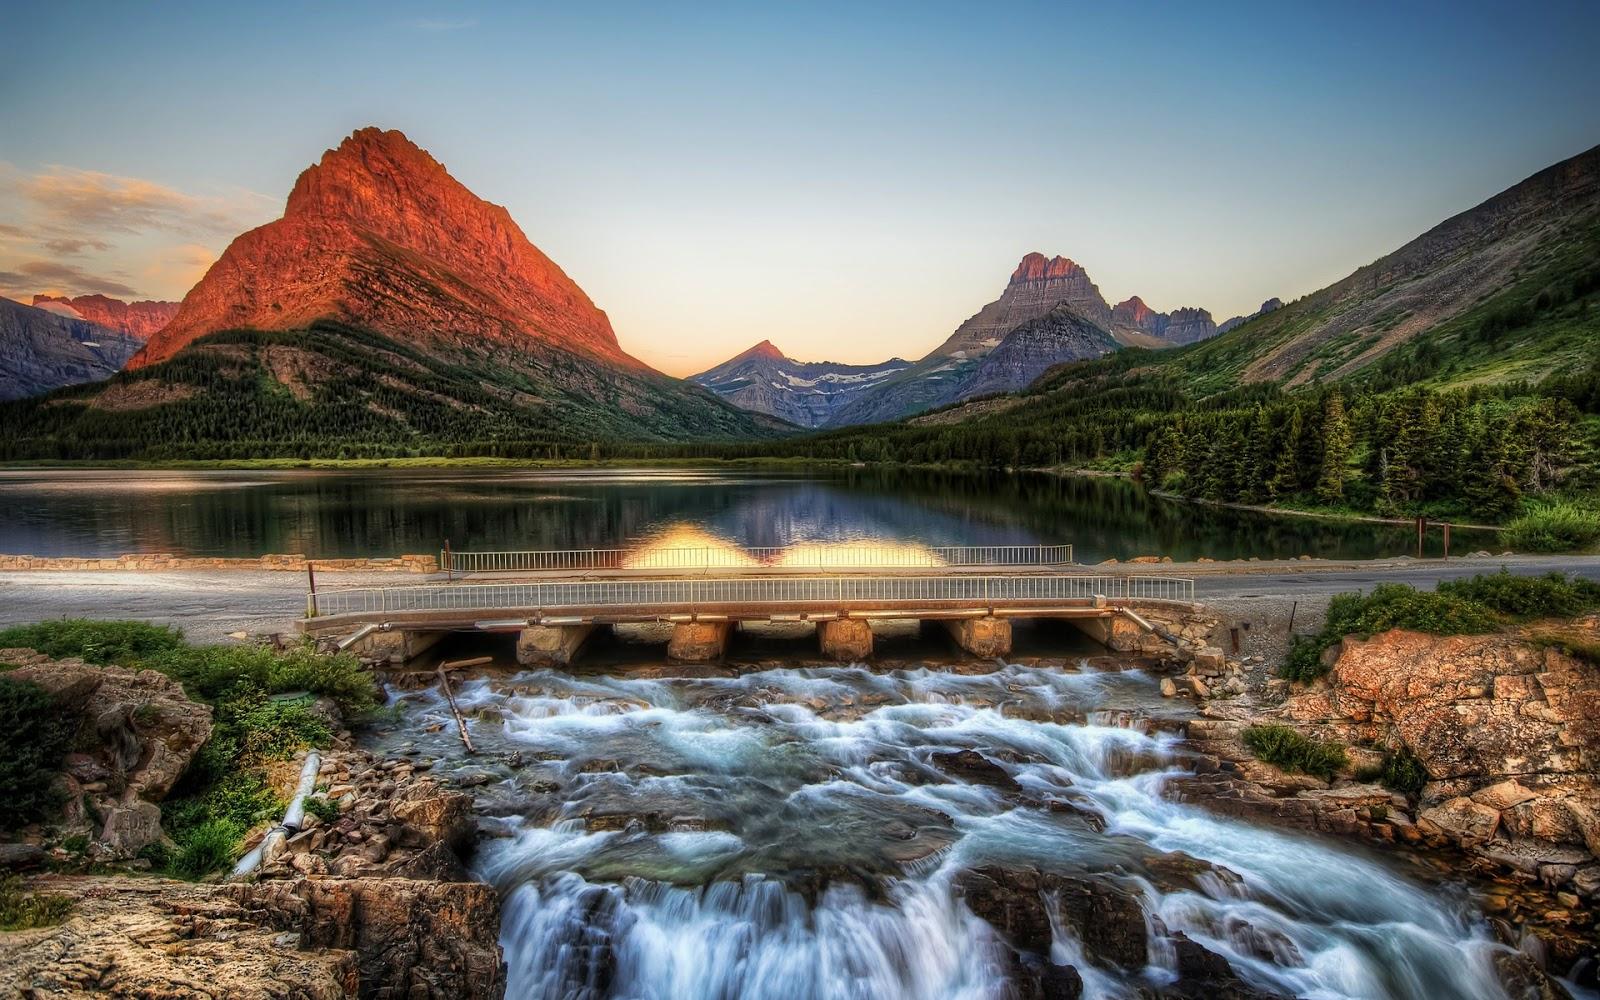 glacier national park photo - photo #24